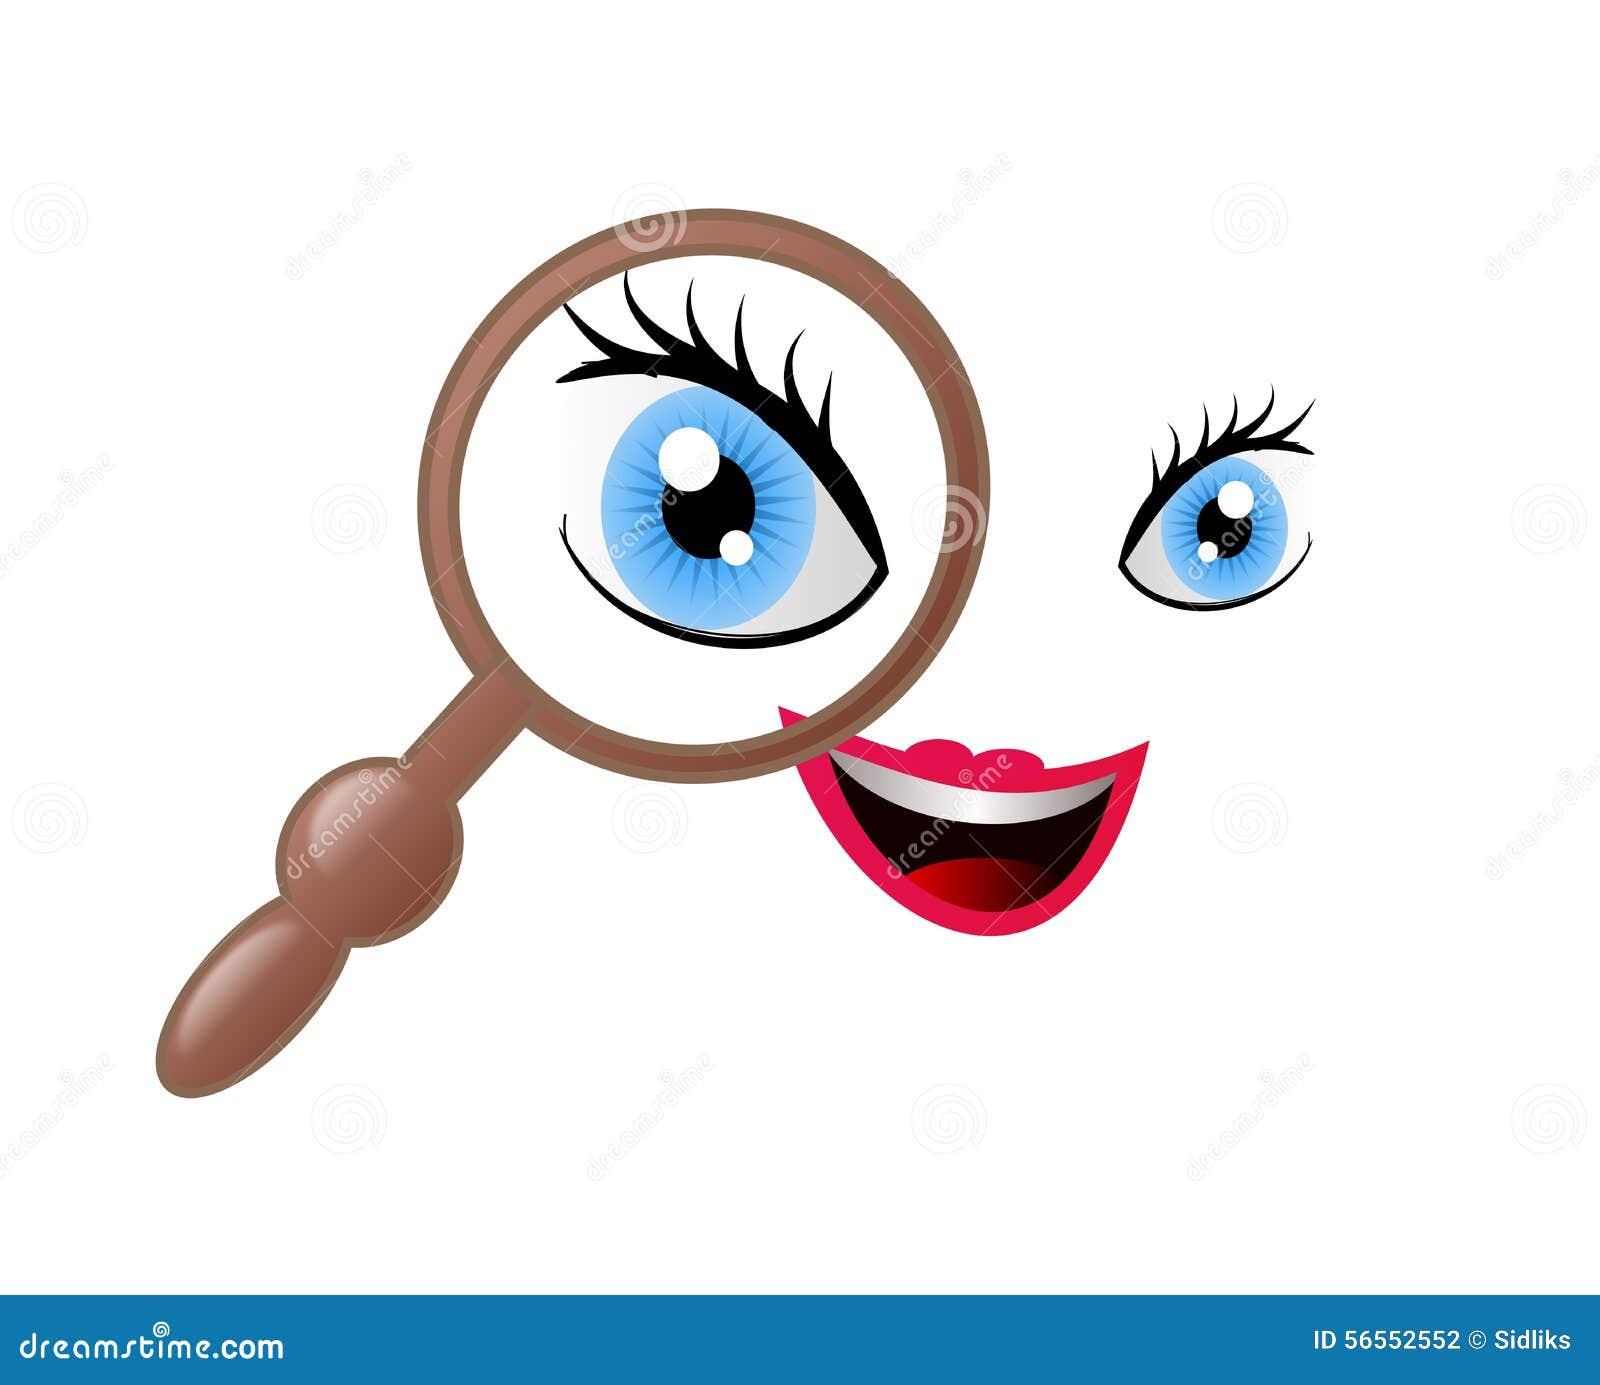 Download Πρόσωπο με πιό magnifier απεικόνιση αποθεμάτων. εικονογραφία από αρκετά - 56552552